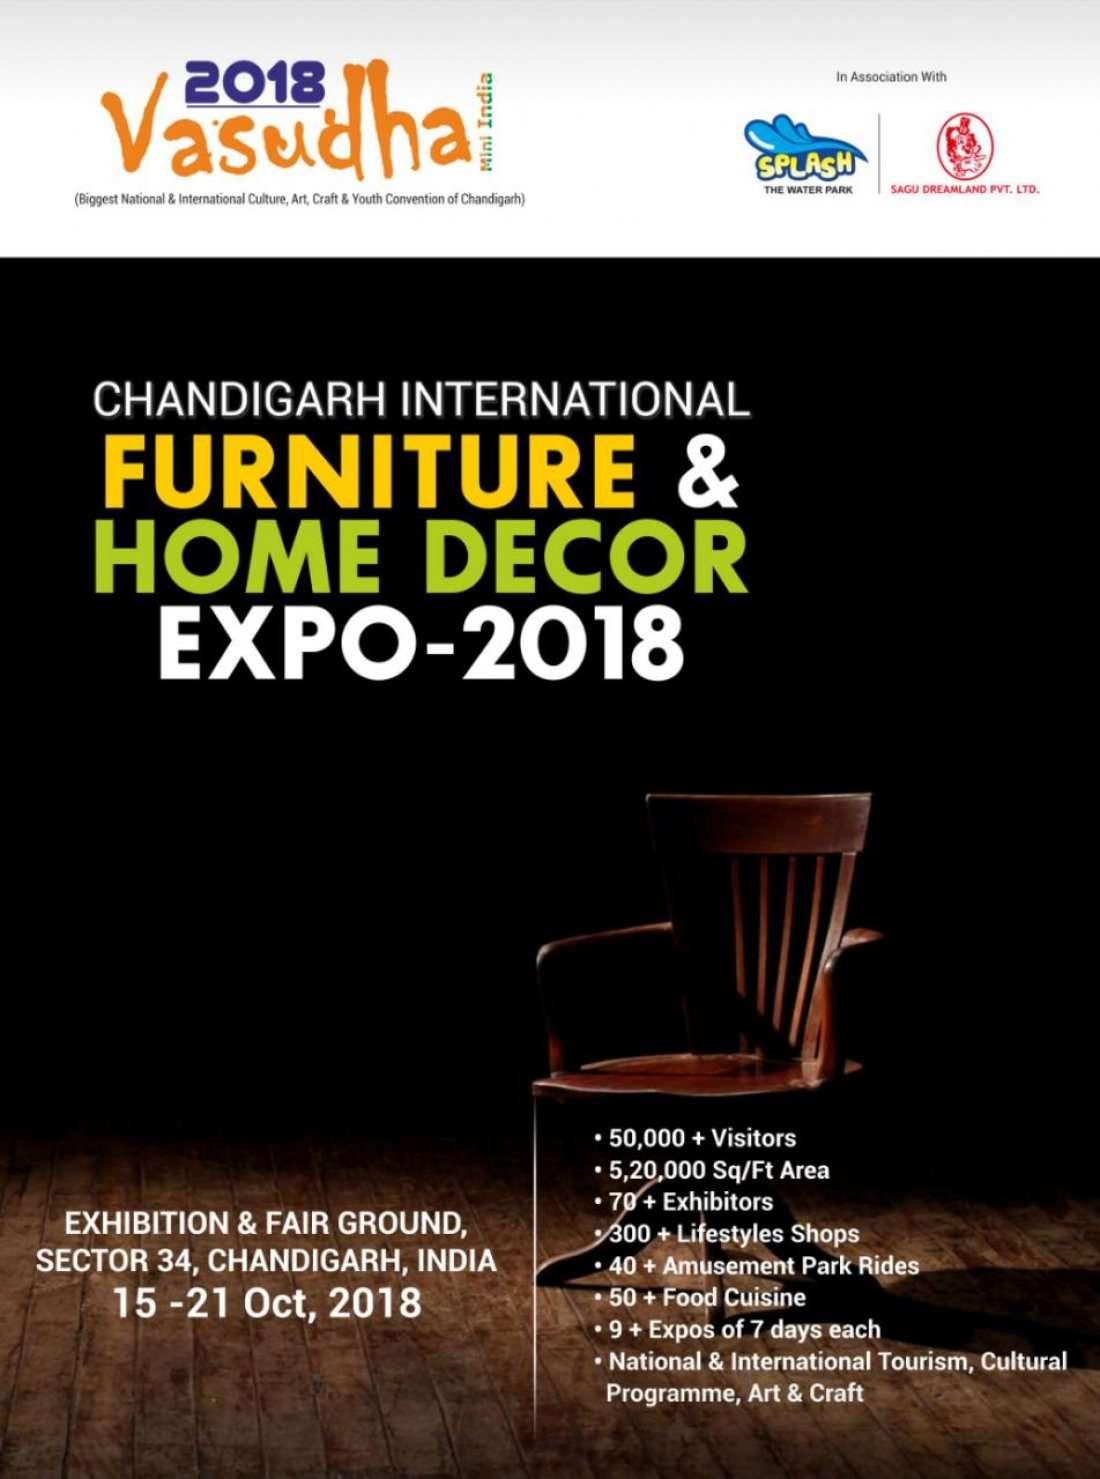 Furniture & Home Decor Expo-2018